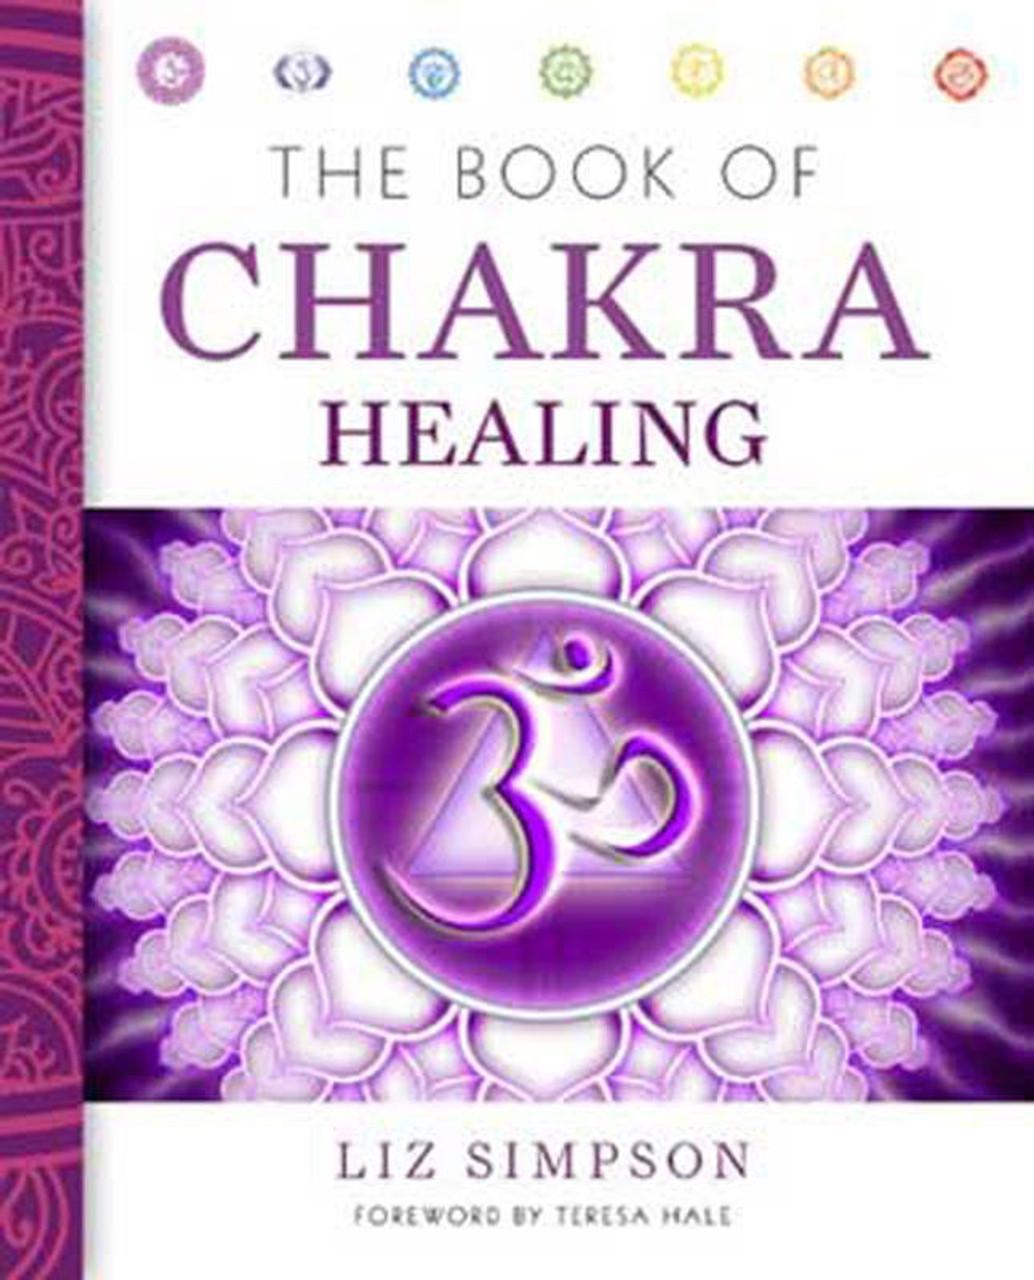 Book of Chakra Healing